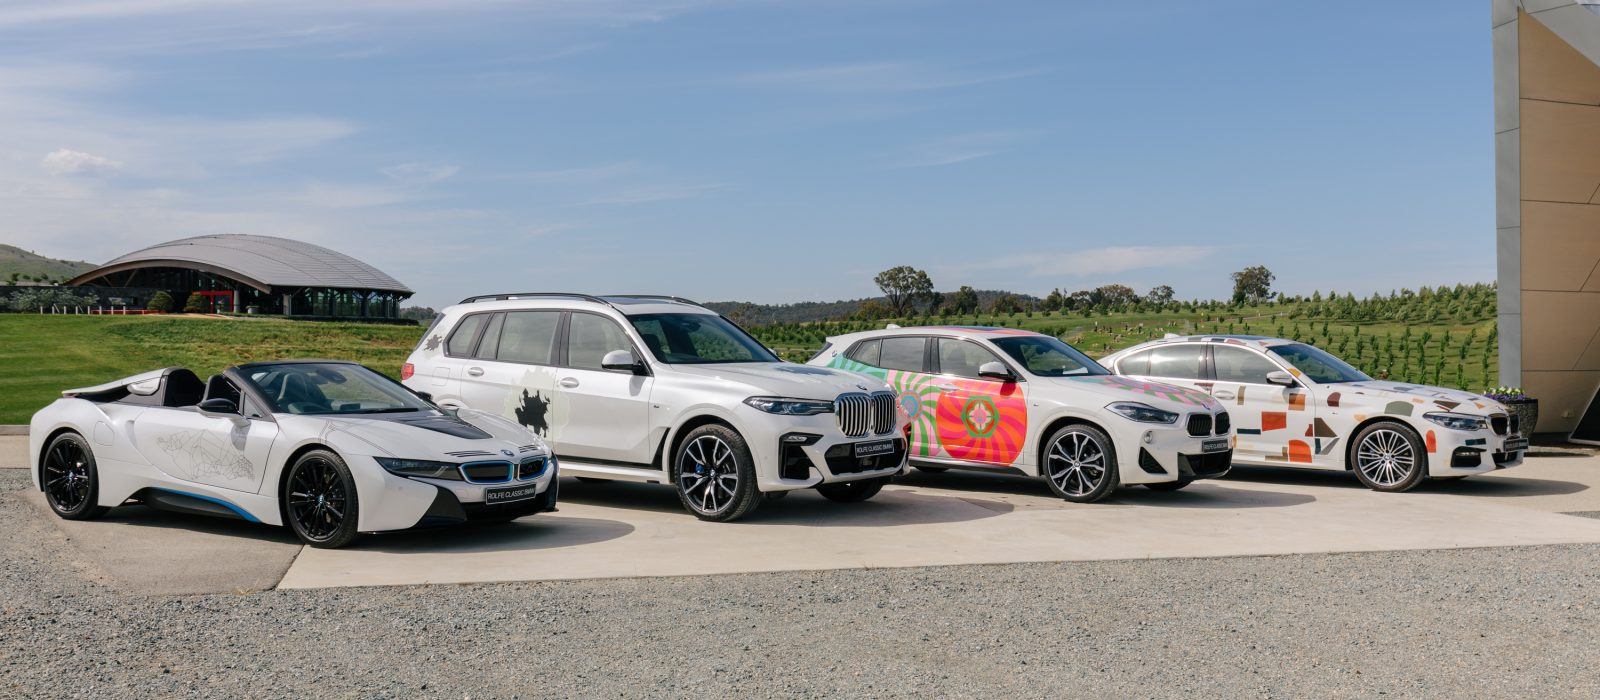 BMW car wrap winners 2020. Photo: 5 Foot Photography